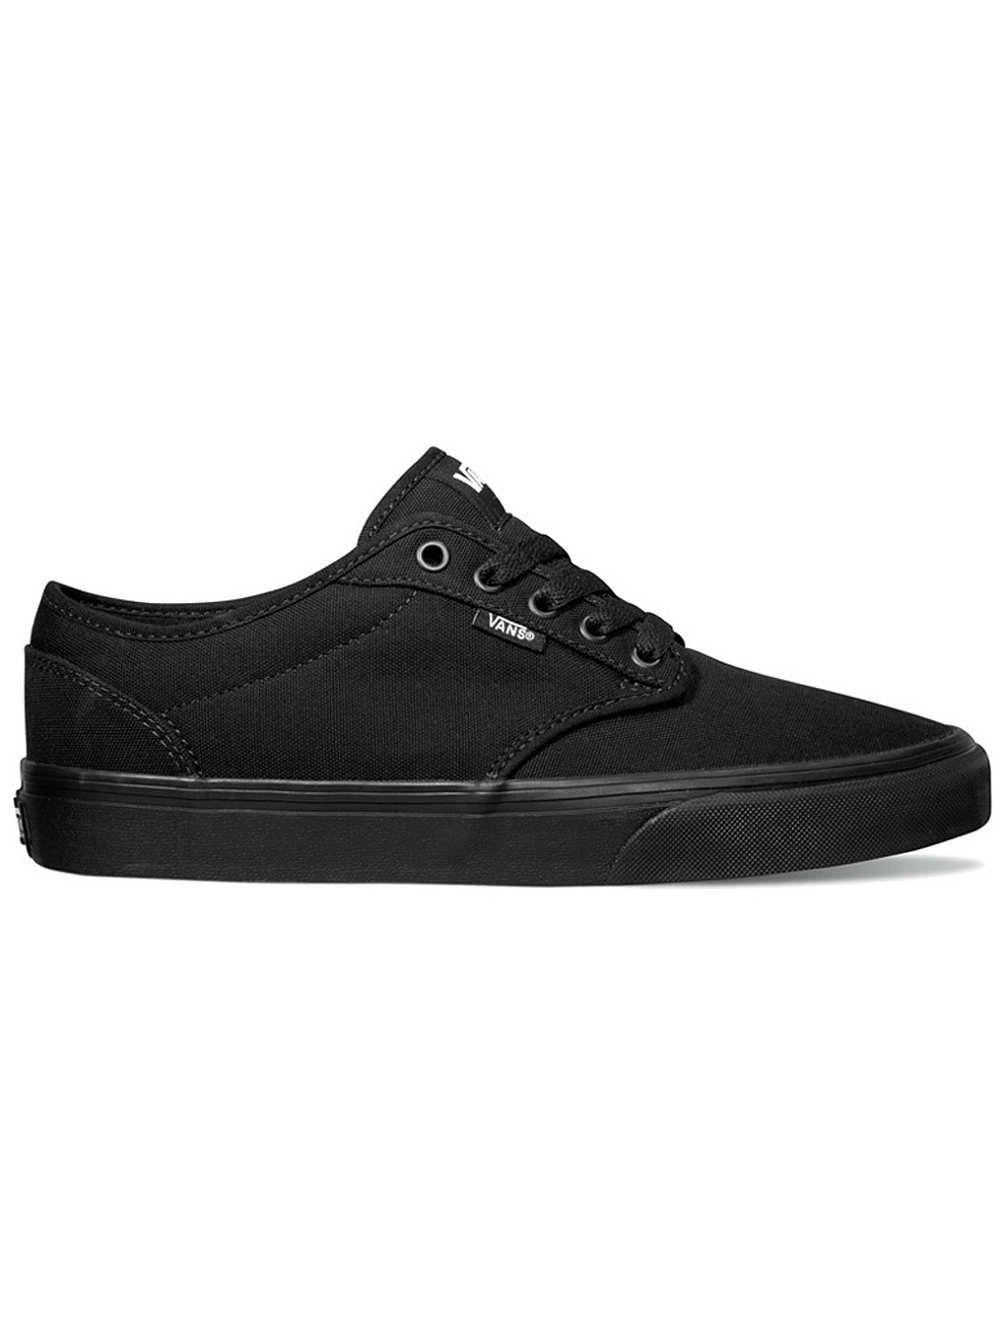 Vans Men's ATWOOD (CANVAS) SKATE SHOES 11 Men US (BLACK/BLACK) by Vans